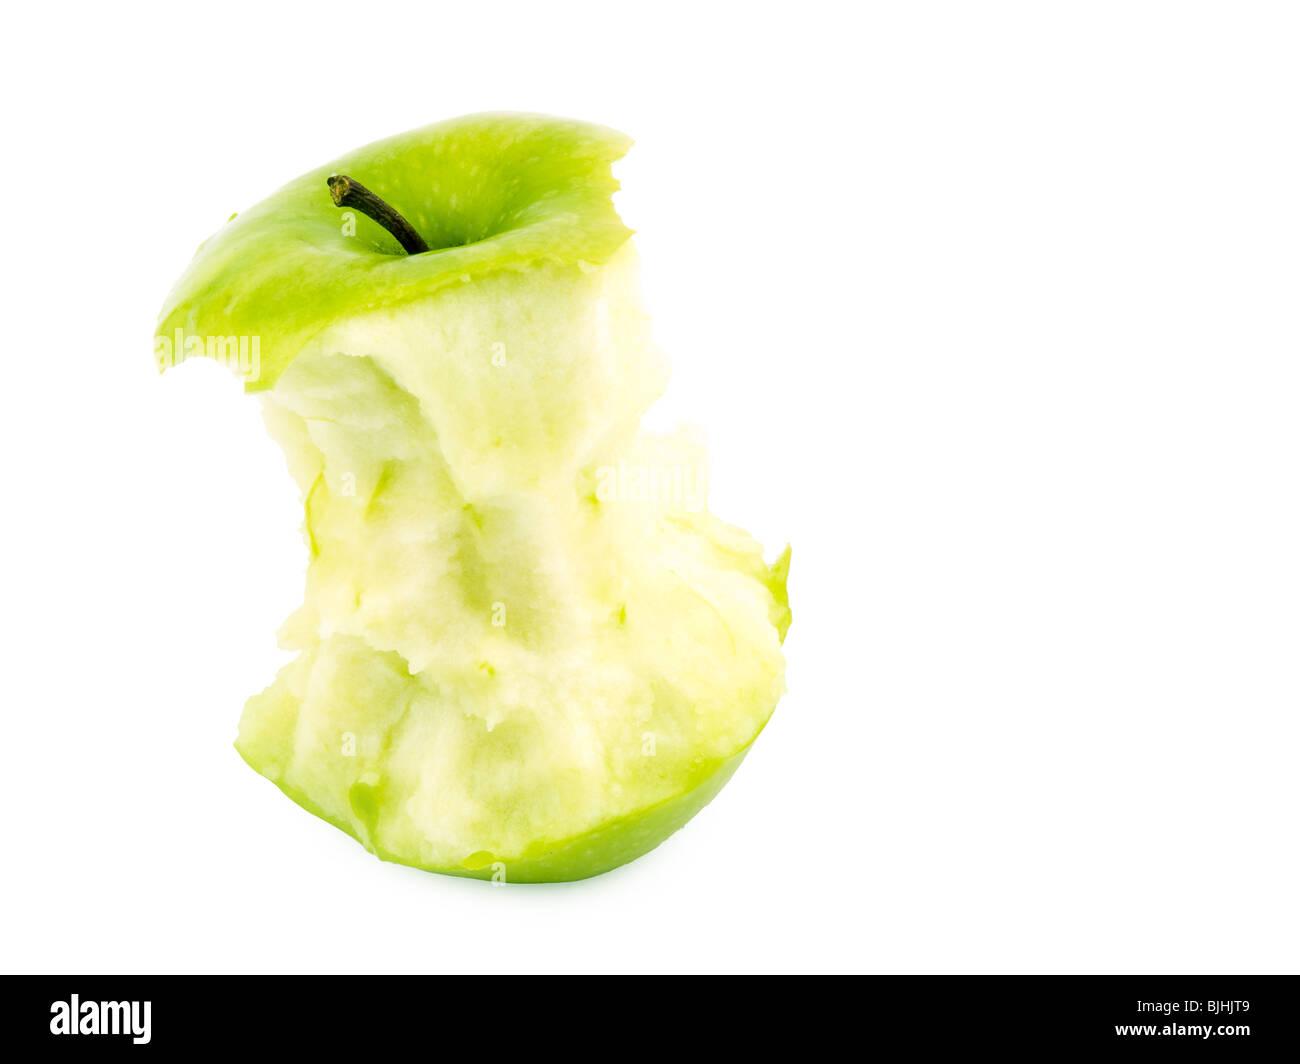 Apple scrap on white background - Stock Image